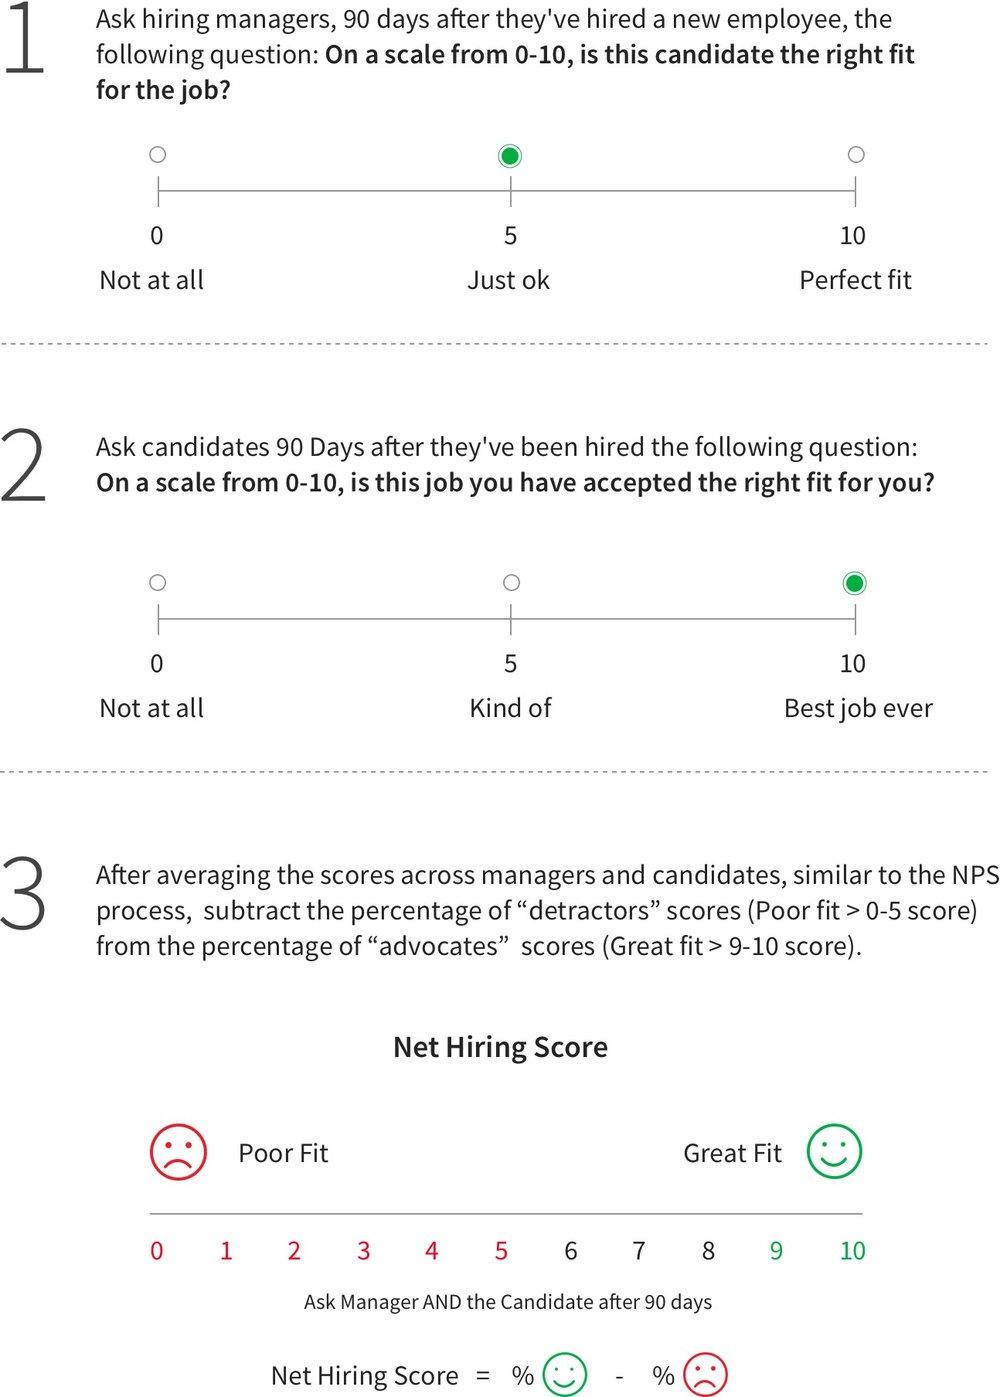 SmartRecruiters_hs-fundamentals-mhs-4b.jpg